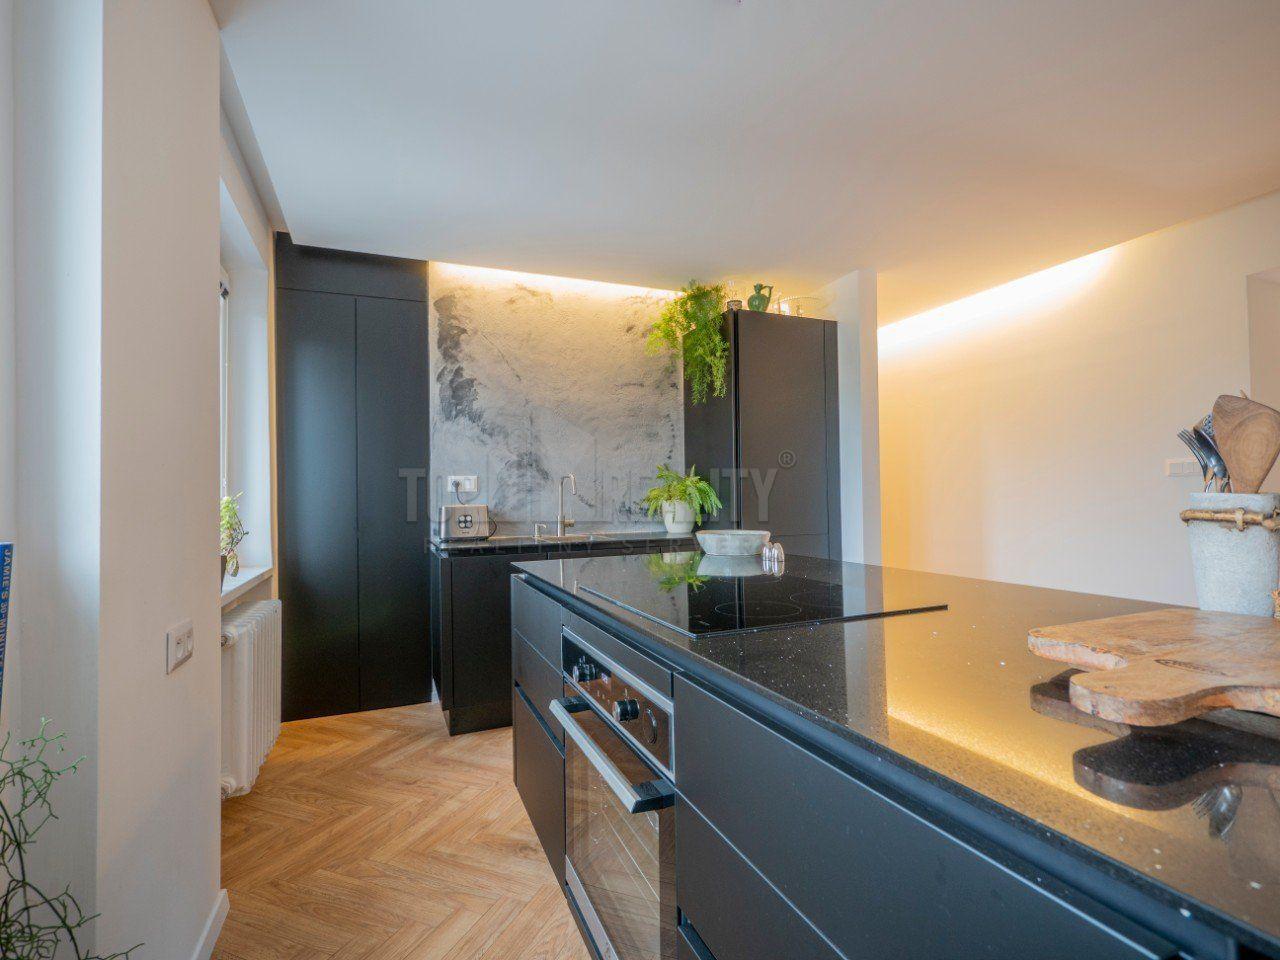 3-izbový byt-Predaj-Trnava-177000.00 €